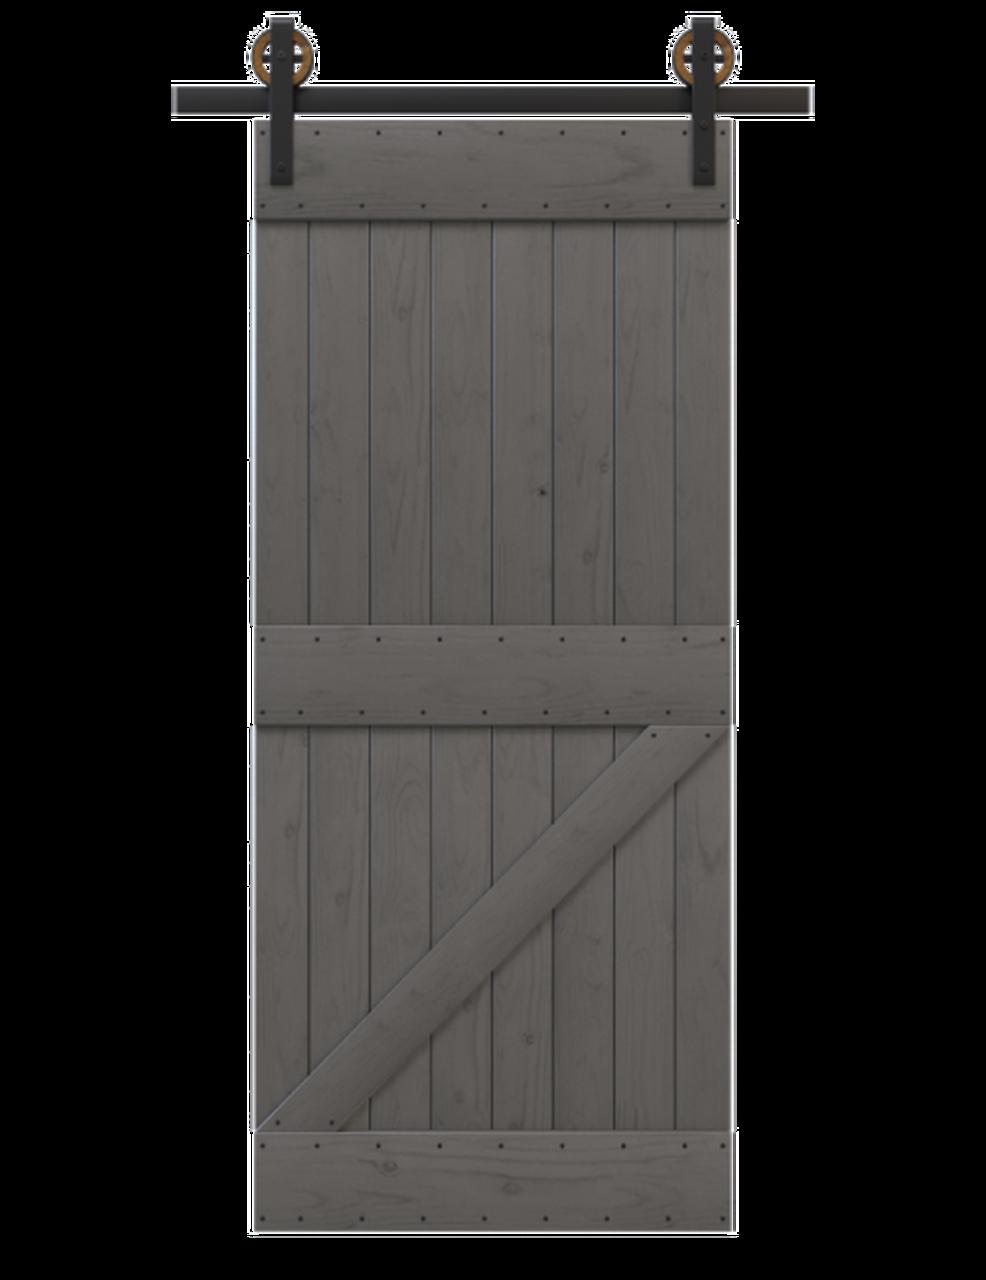 charcoal painted wood board and batten barn door